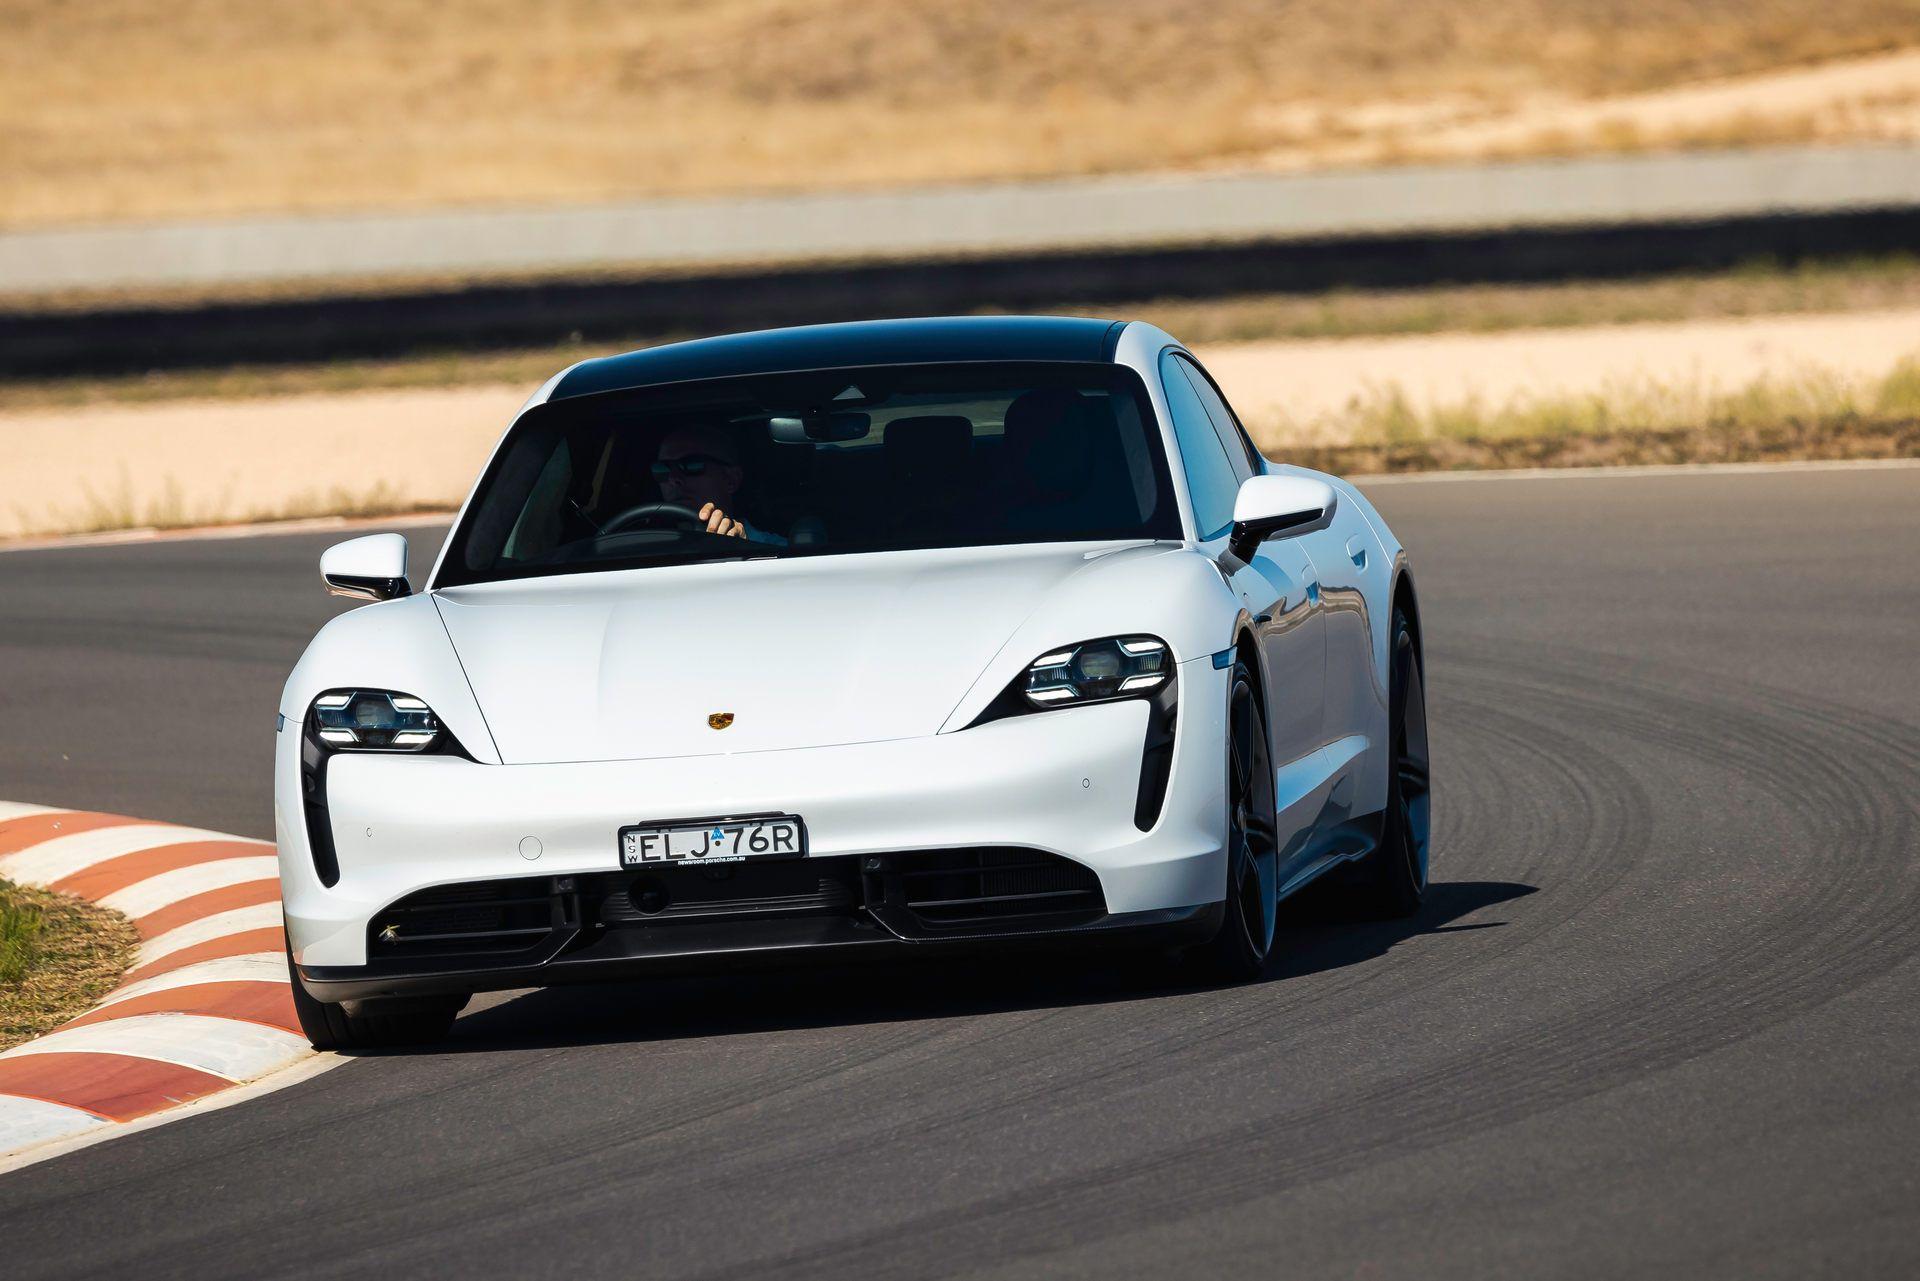 Porsche-Taycan-Turbo-S-The-Bend-Motorsport-Park-28